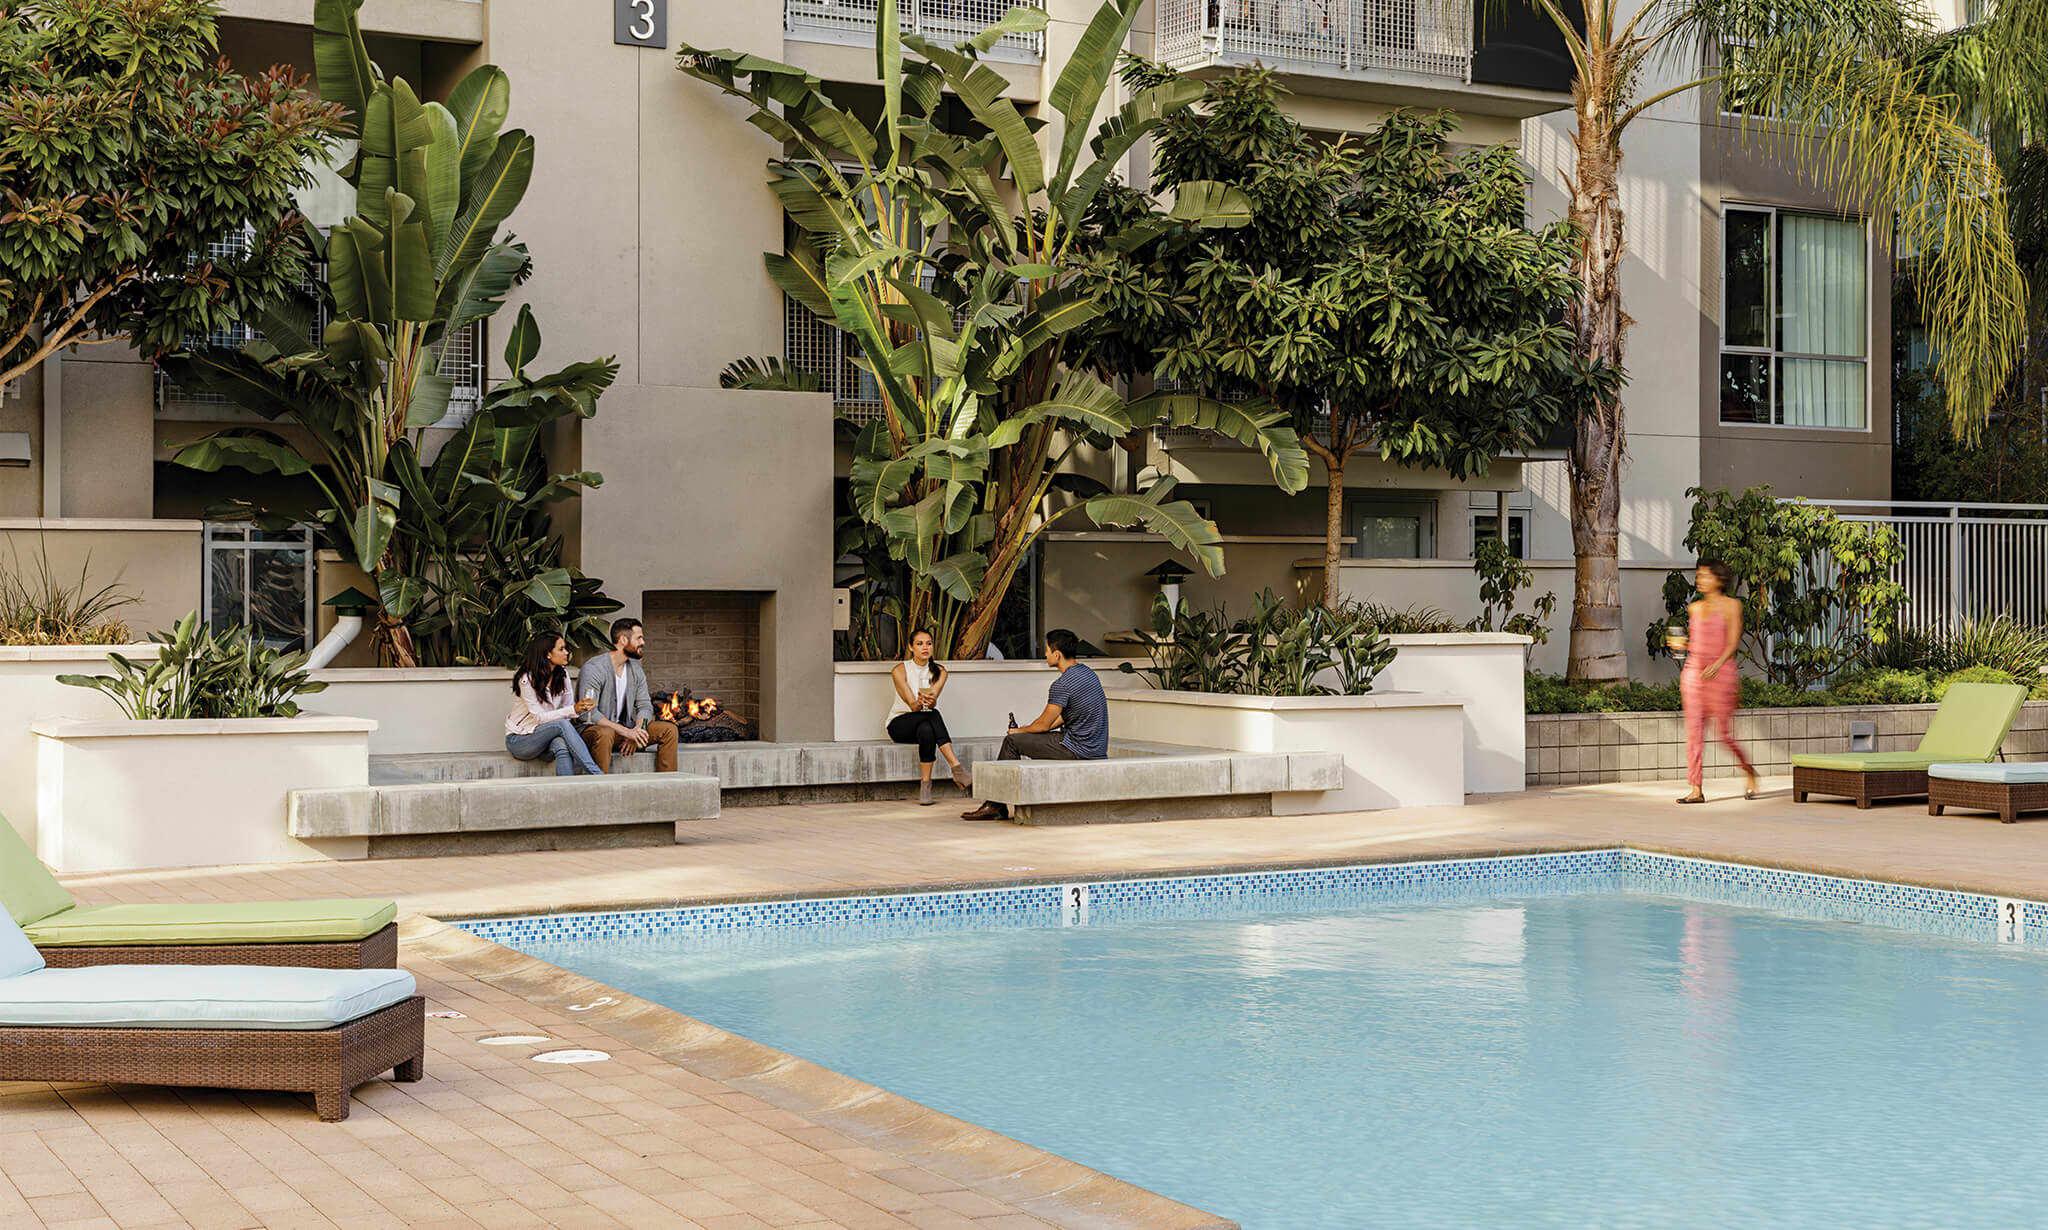 550 Moreland Apartments apartments in Santa Clara CA to rent photo 8